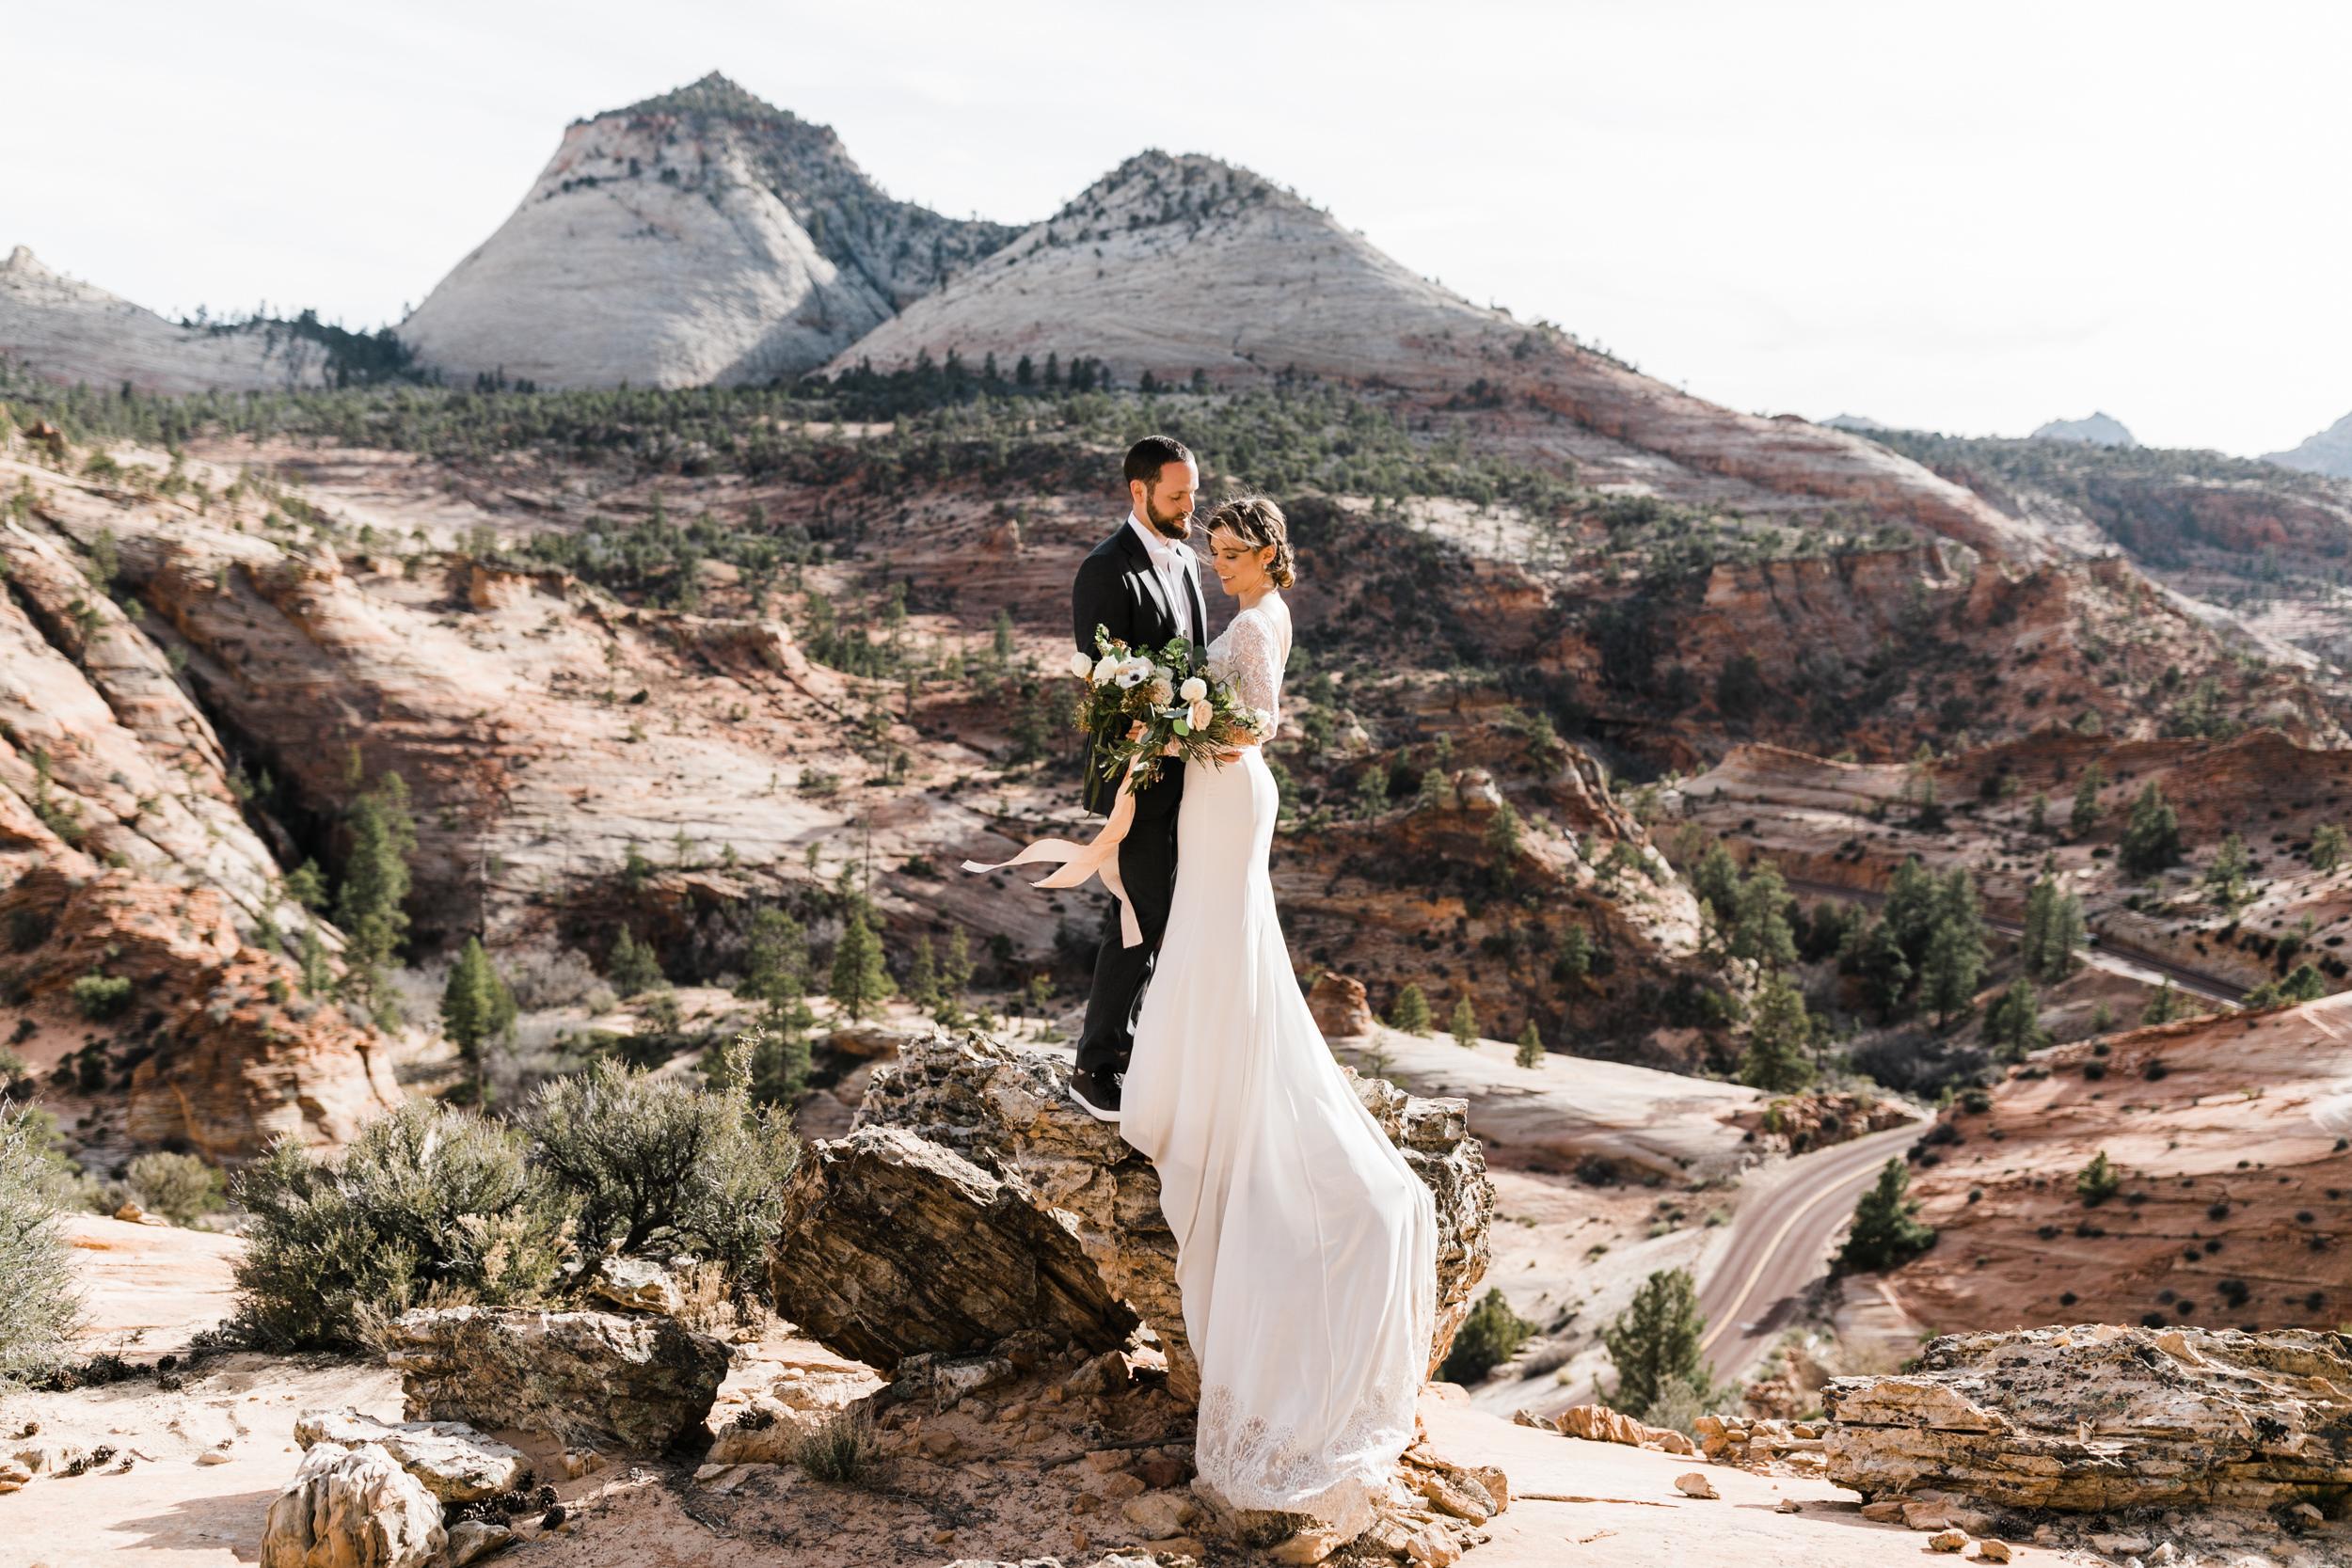 Zion-National-Park-Adventure-Wedding-Hearnes-Elopement-Photography-30.jpg